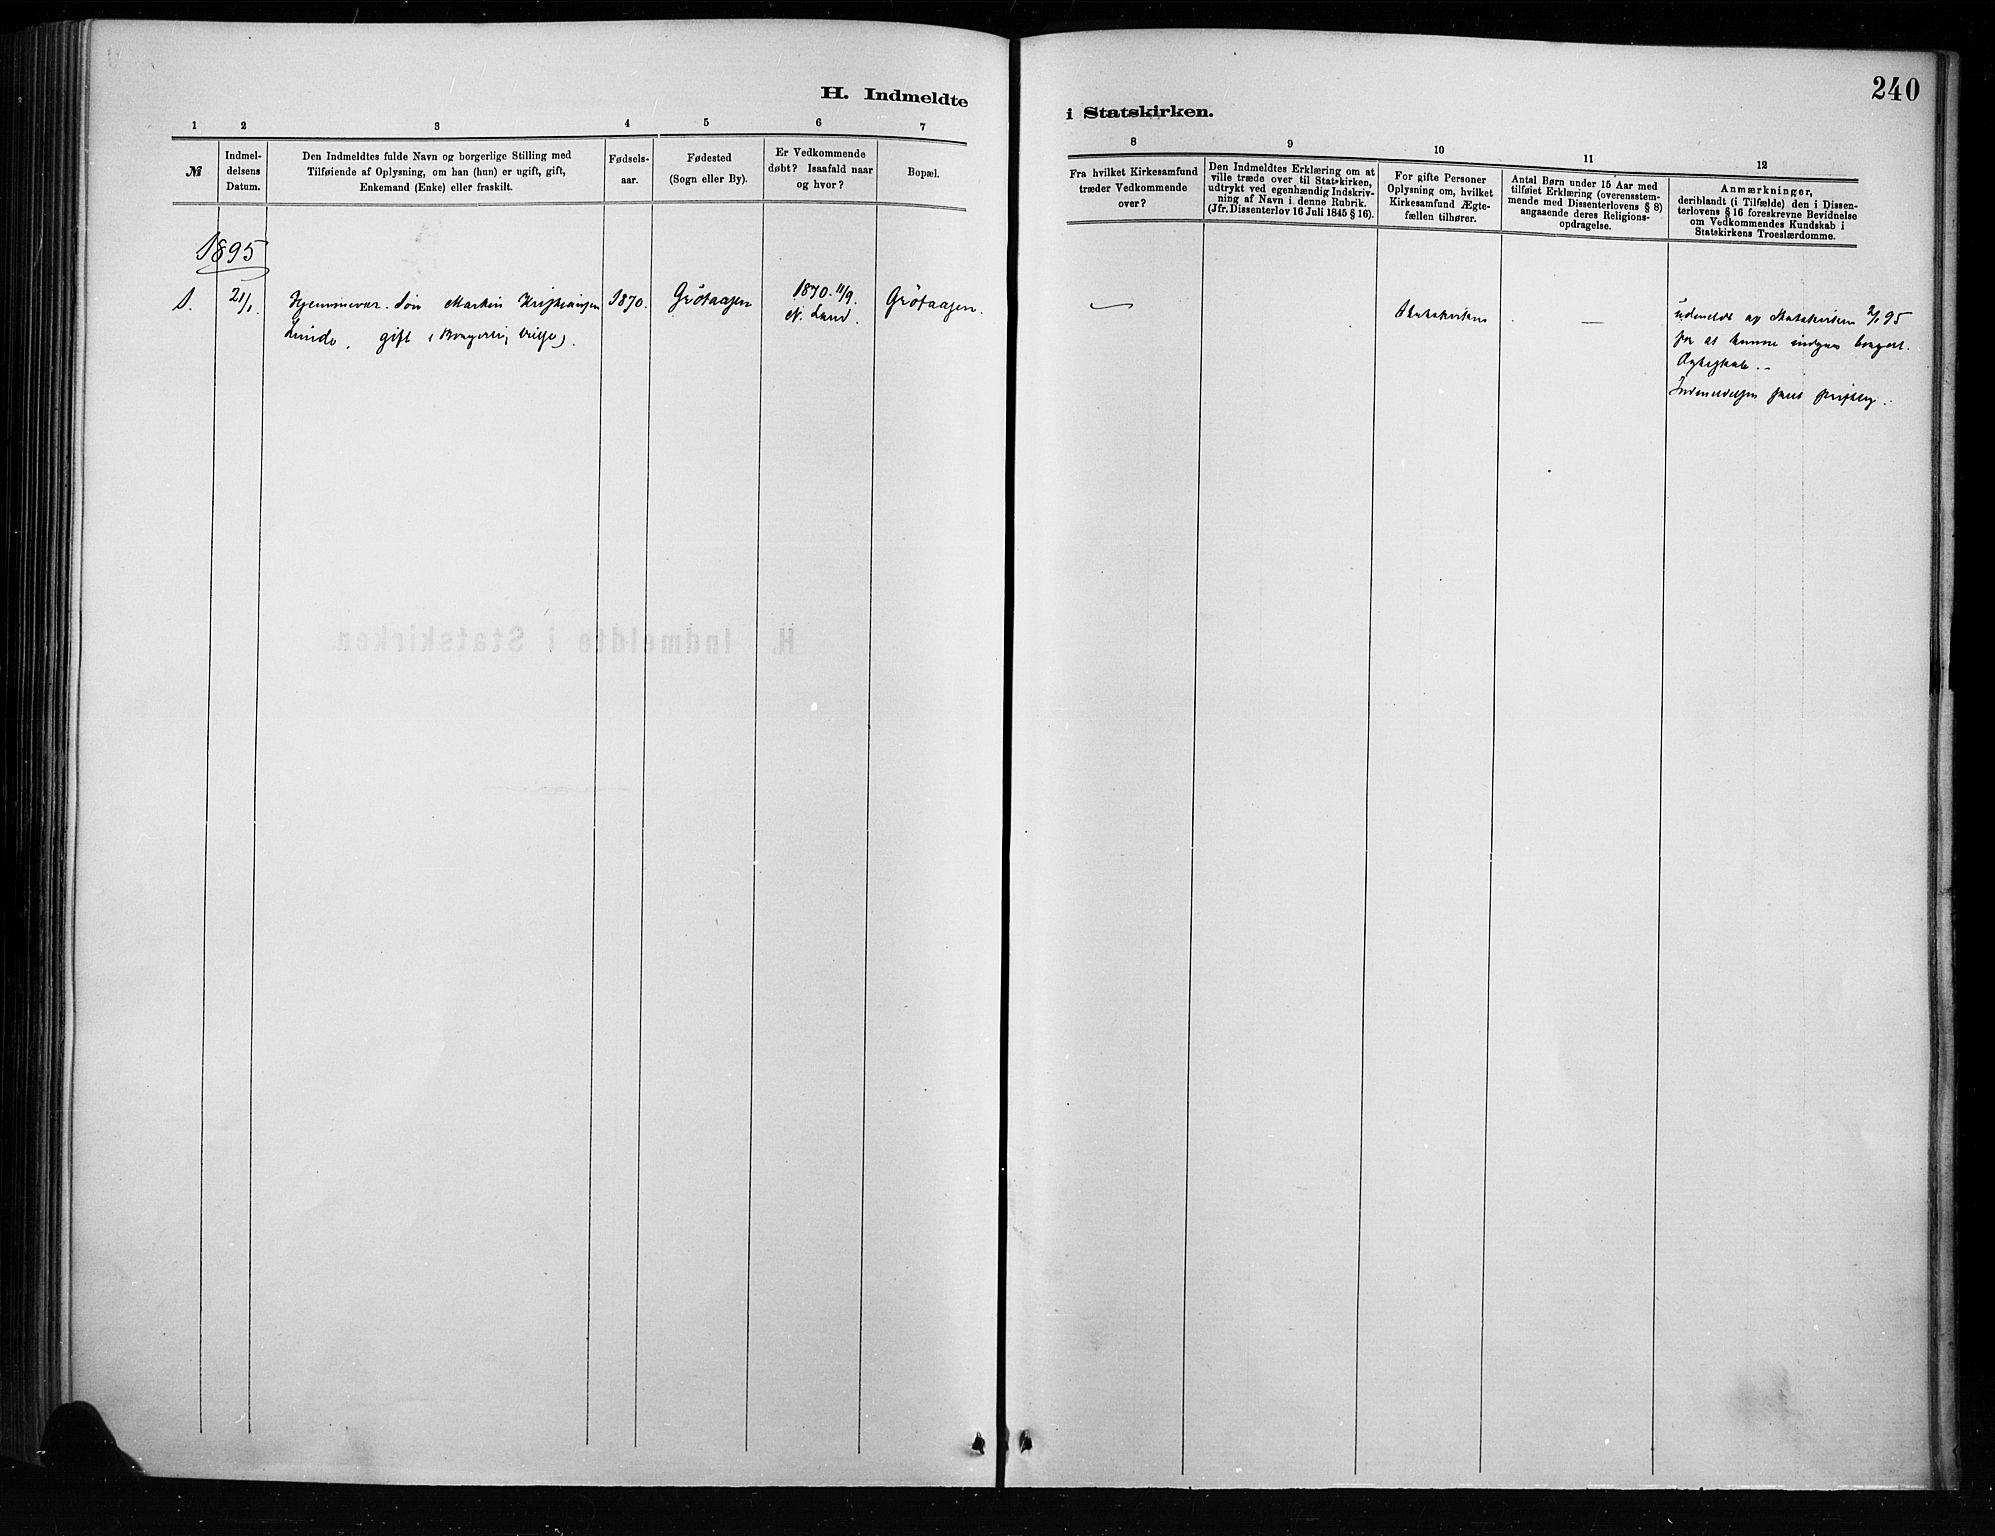 SAH, Nordre Land prestekontor, Ministerialbok nr. 4, 1882-1896, s. 240